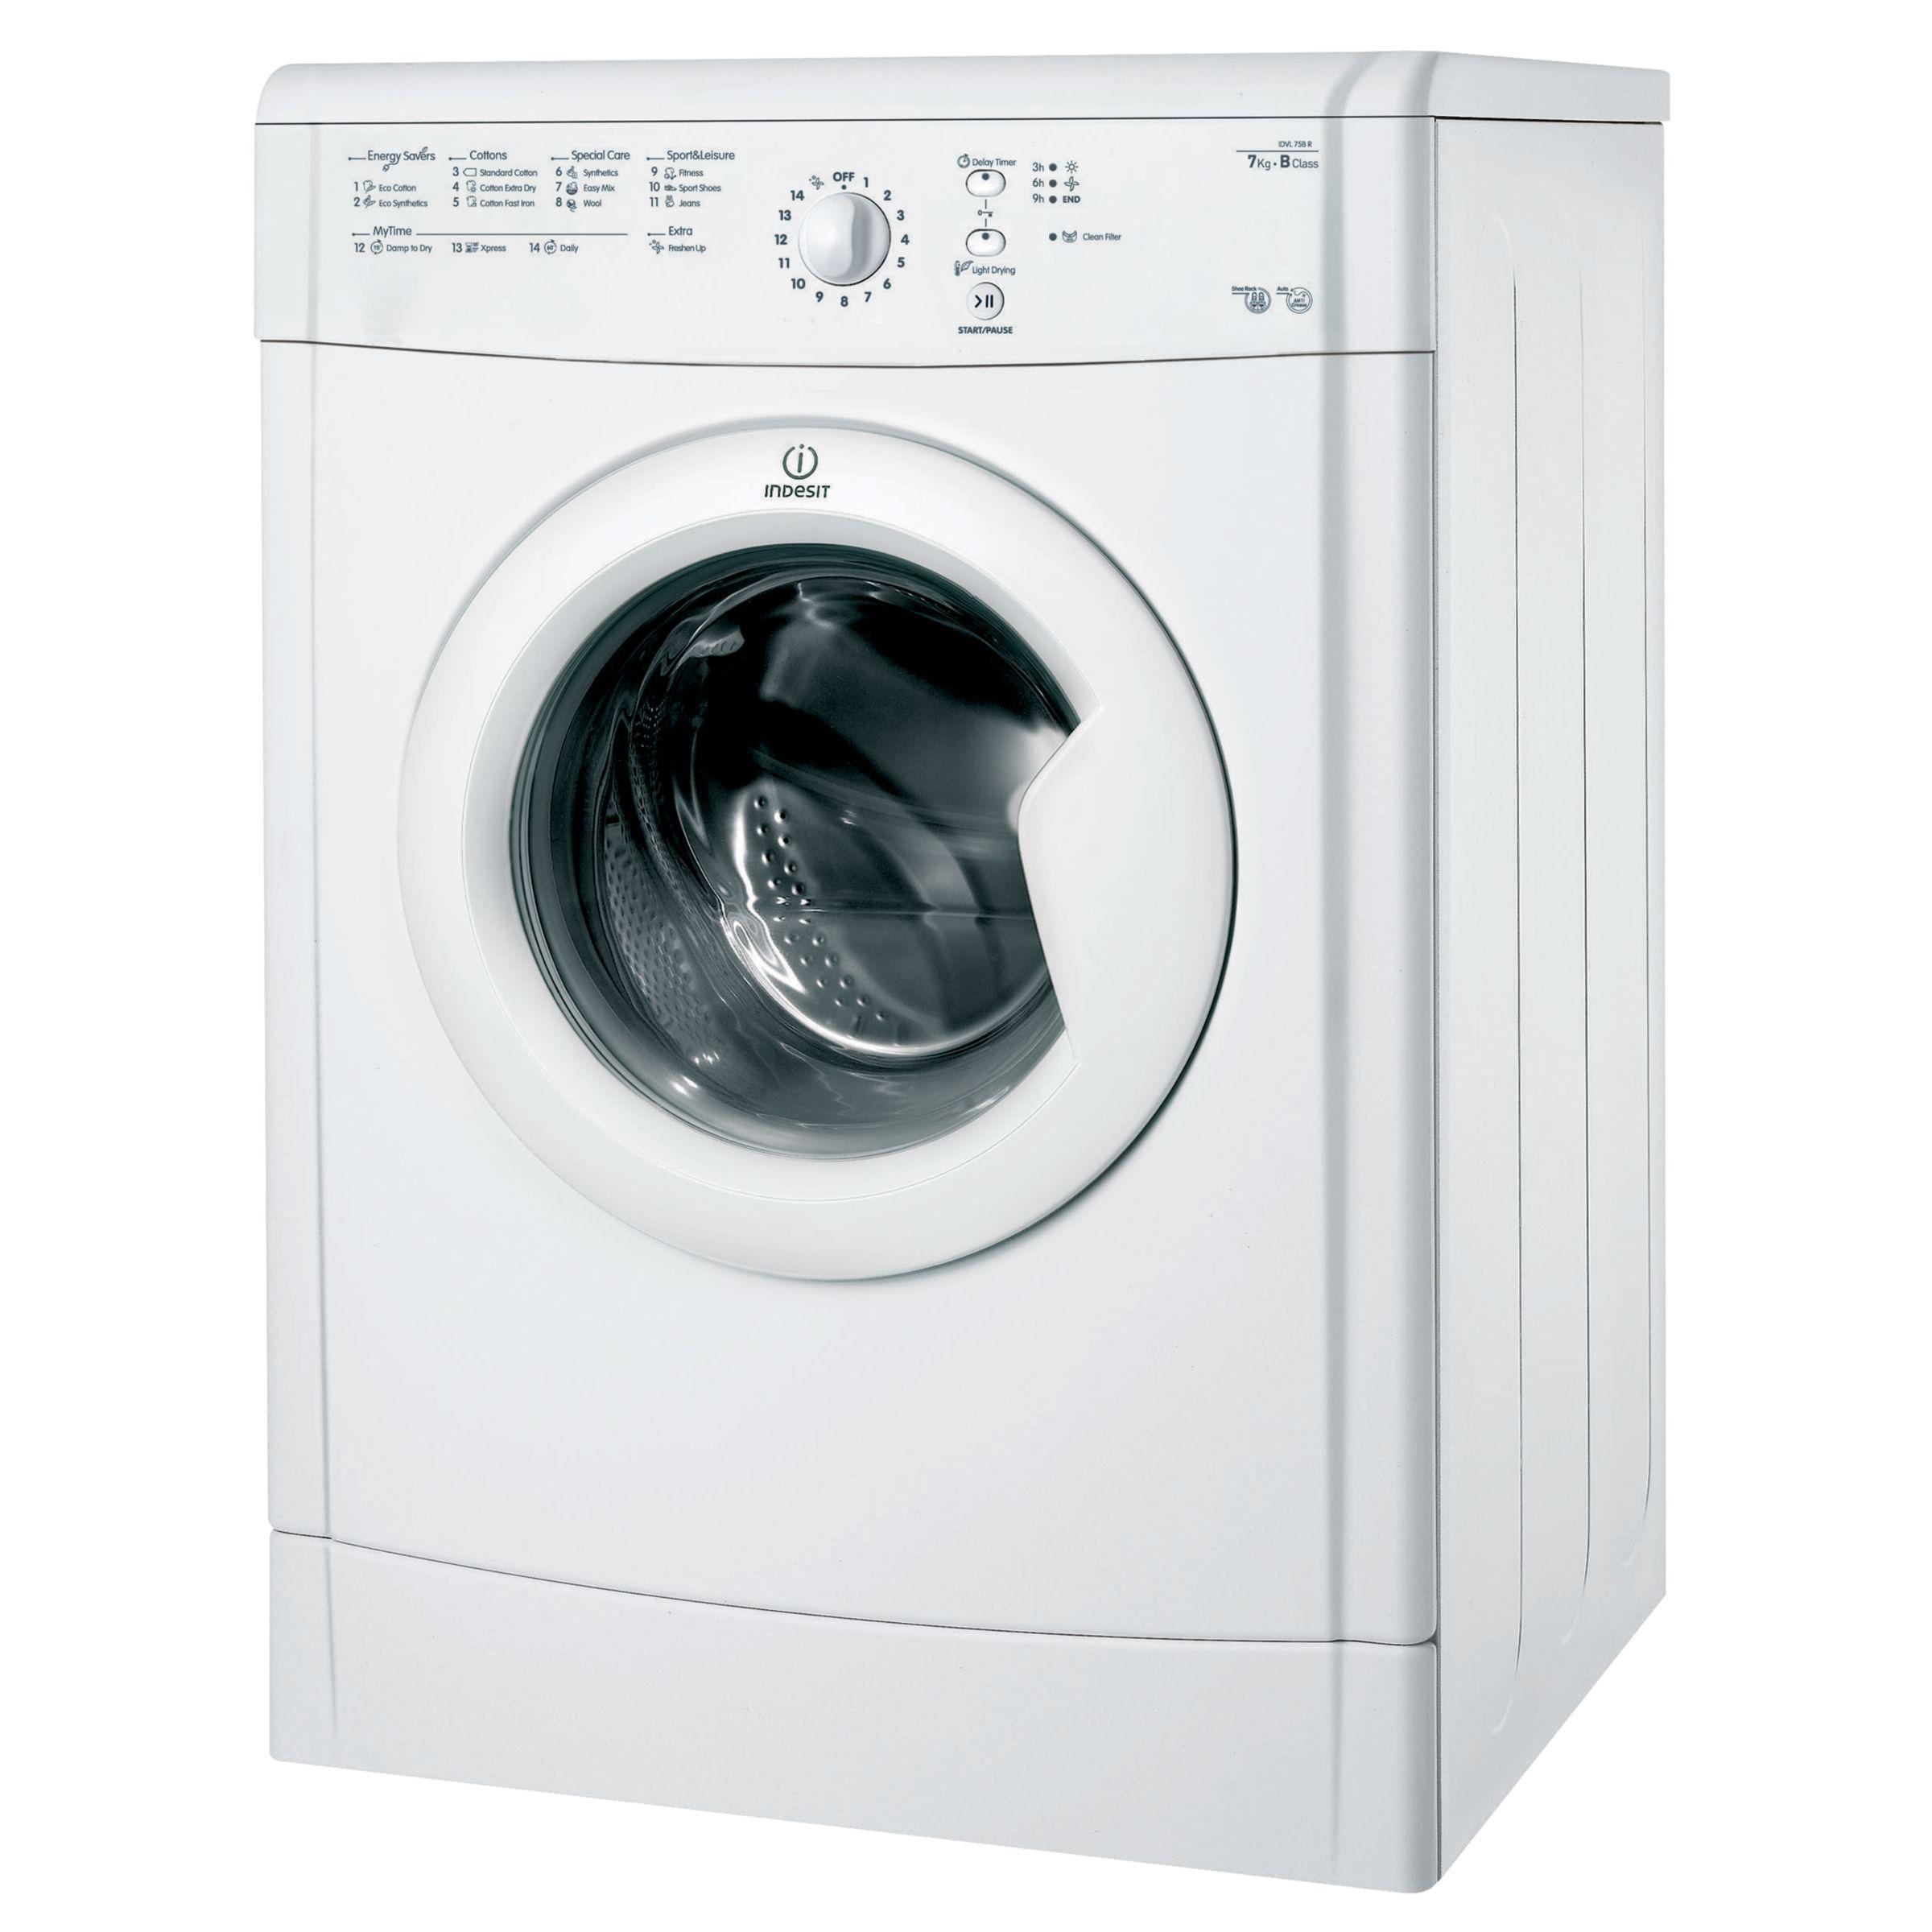 Indesit IDVL75BR Vented Tumble Dryer, 7kg Load, C Energy Rating, White